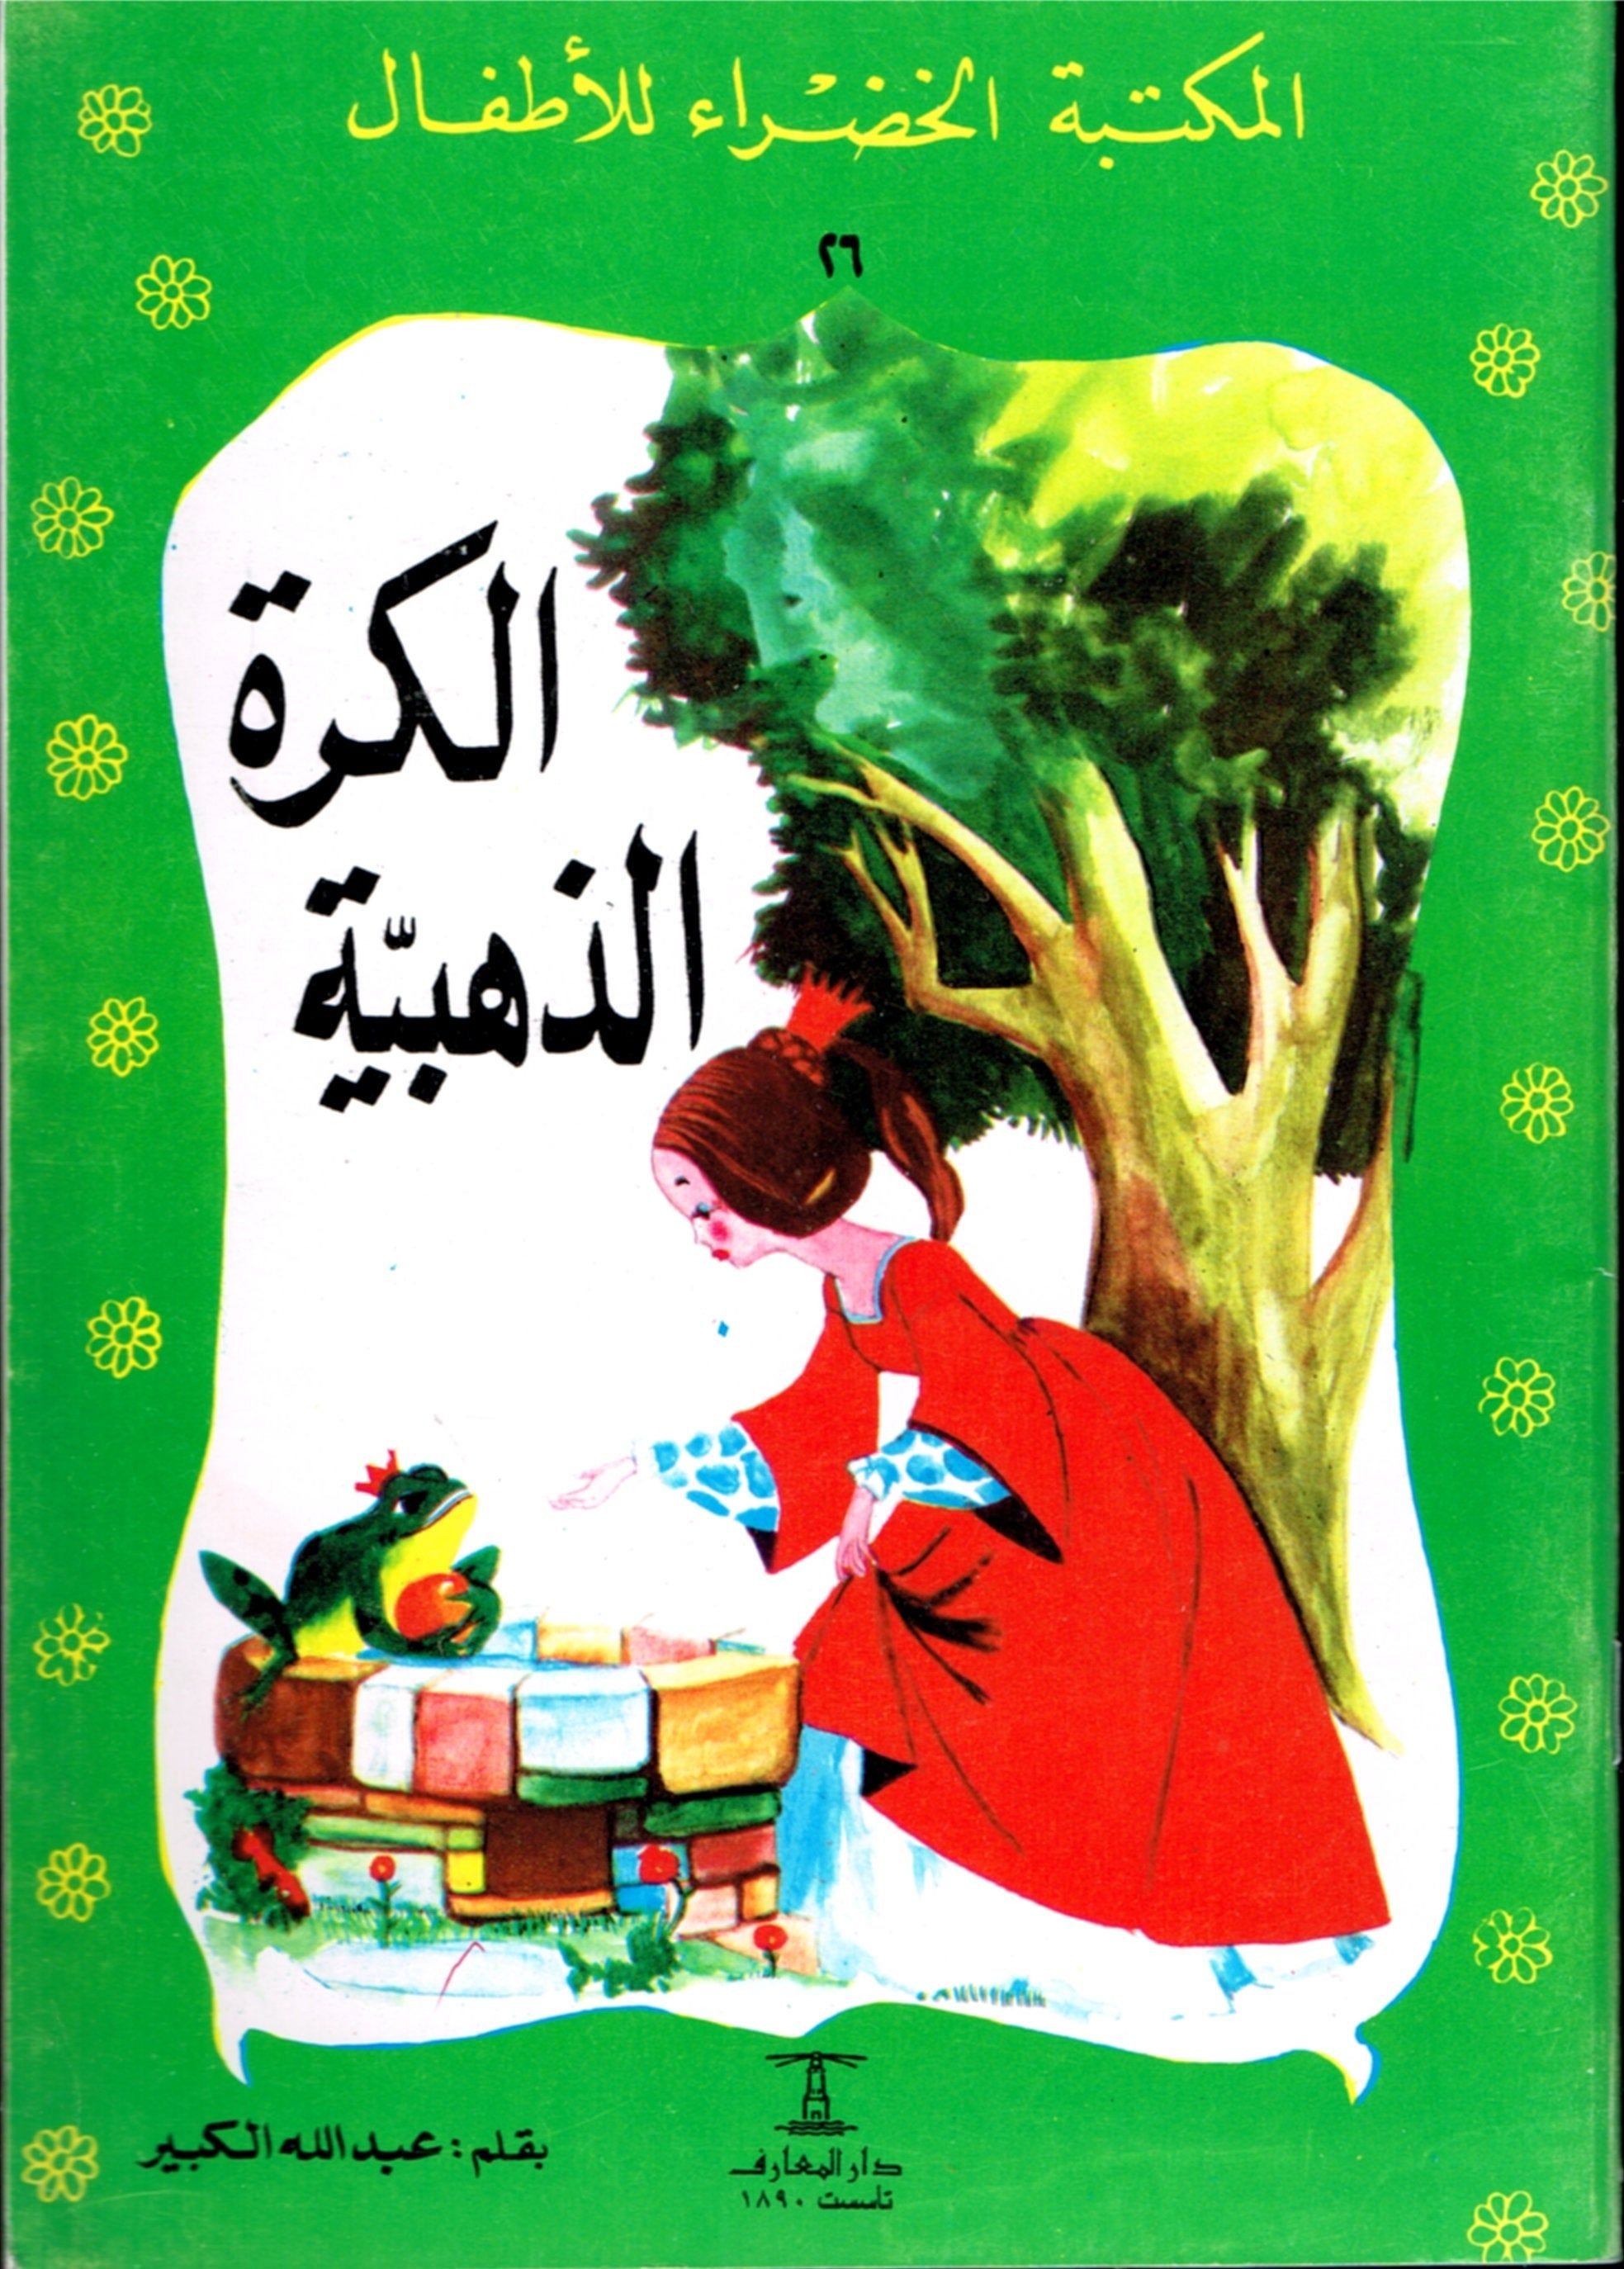 Excited To Share The Latest Addition To My Etsy Shop Arabic Children Book Al Maktaba Al Khadra Al Kora Ada Reading Cartoon Arabic Books Disney Animated Films